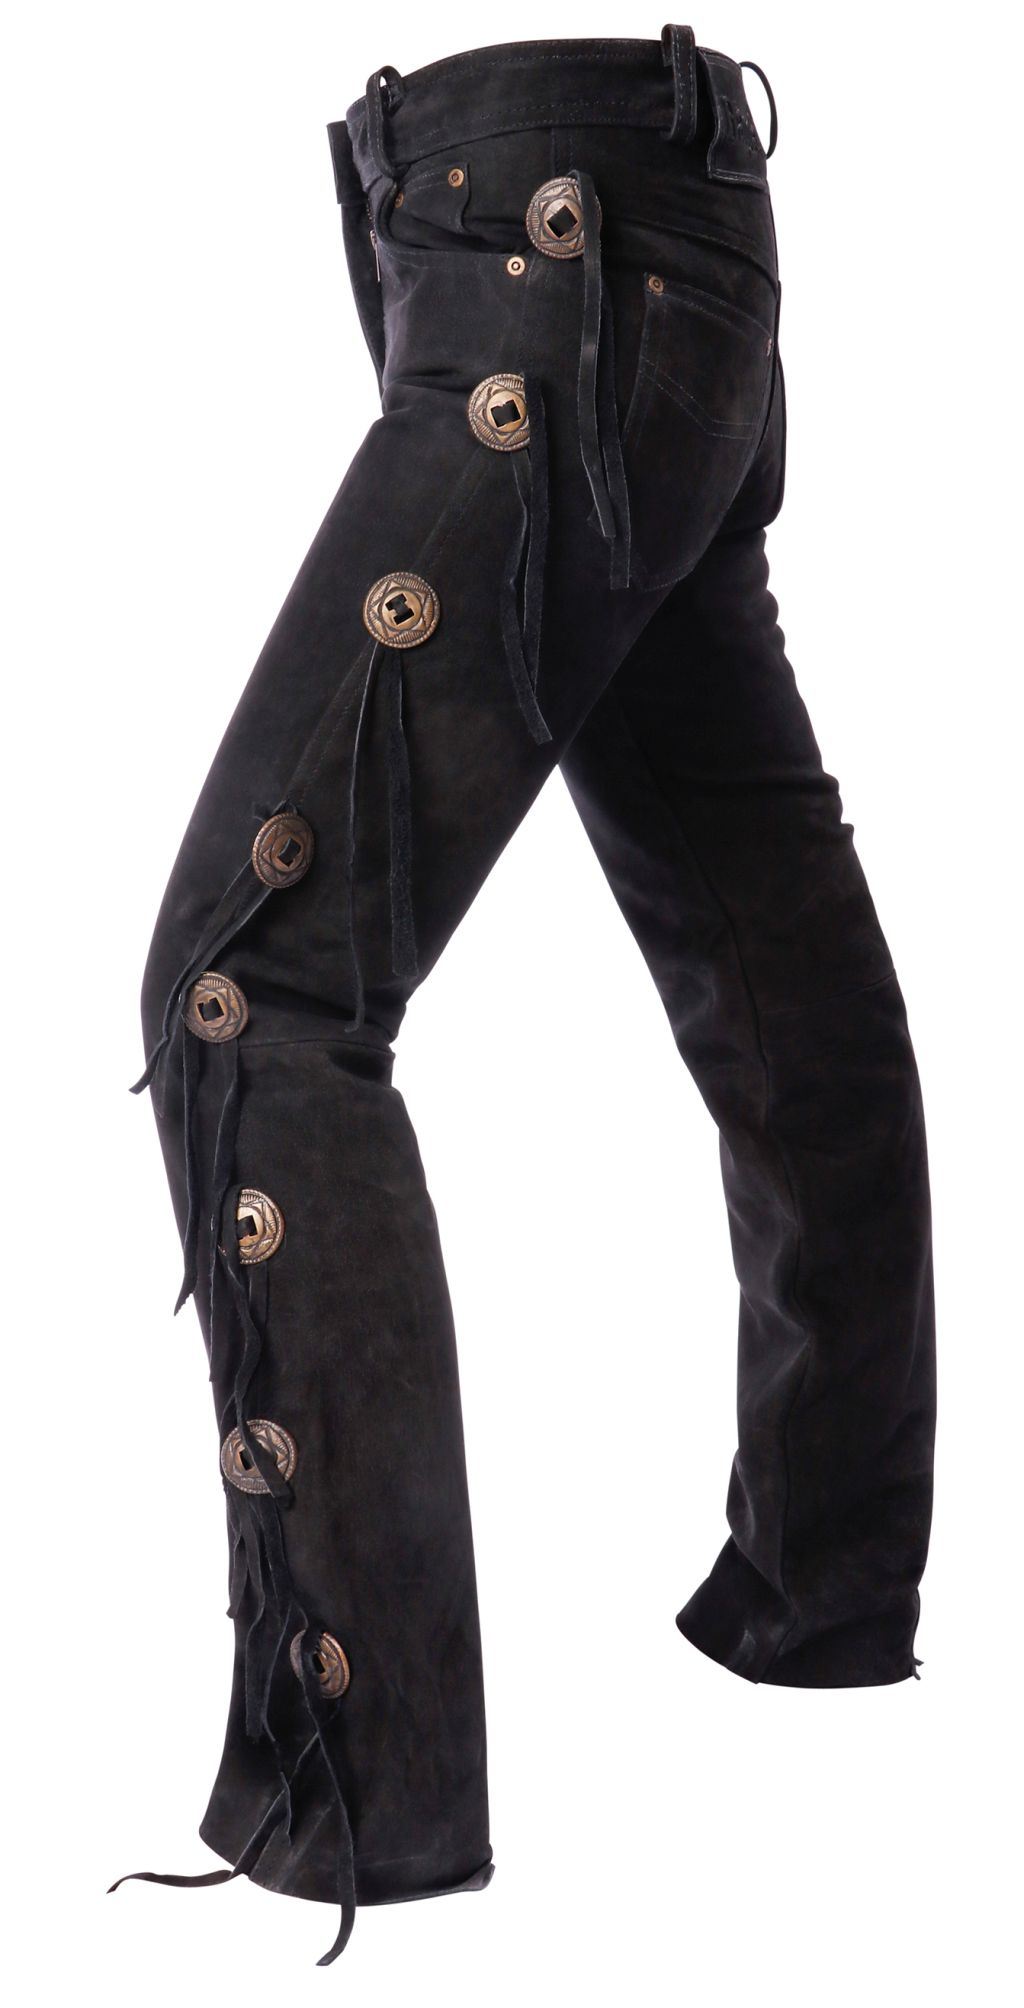 Bangla Concho Lederhose Jeans Western Motorrad Schwarz 29 - 38 inch